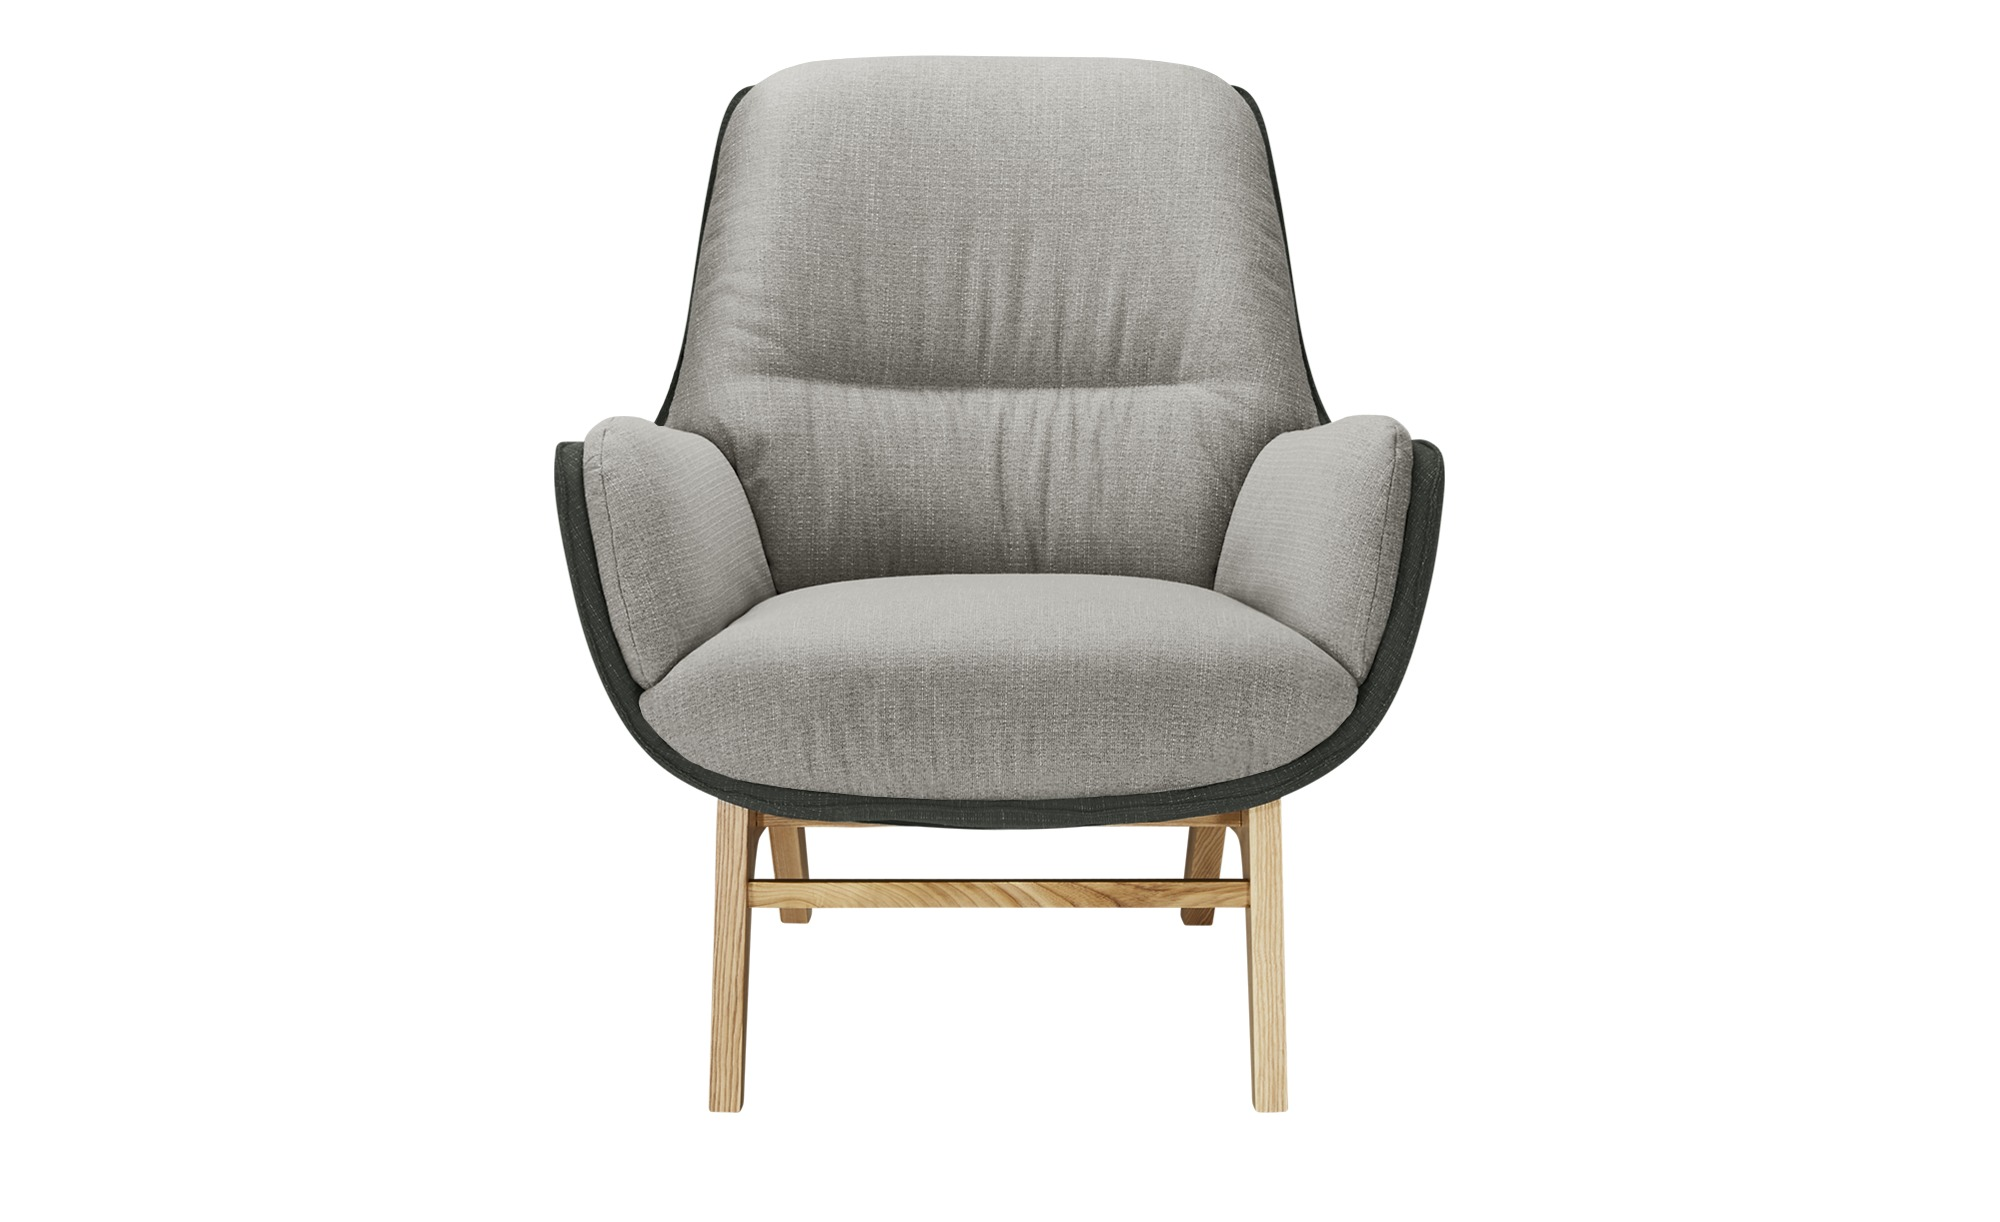 Gray & Jones Sessel  Cap Ferrat Homi ¦ grau ¦ Maße (cm): B: 77 H: 95 T: 88 Polstermöbel > Sessel > Polstersessel - Höffner